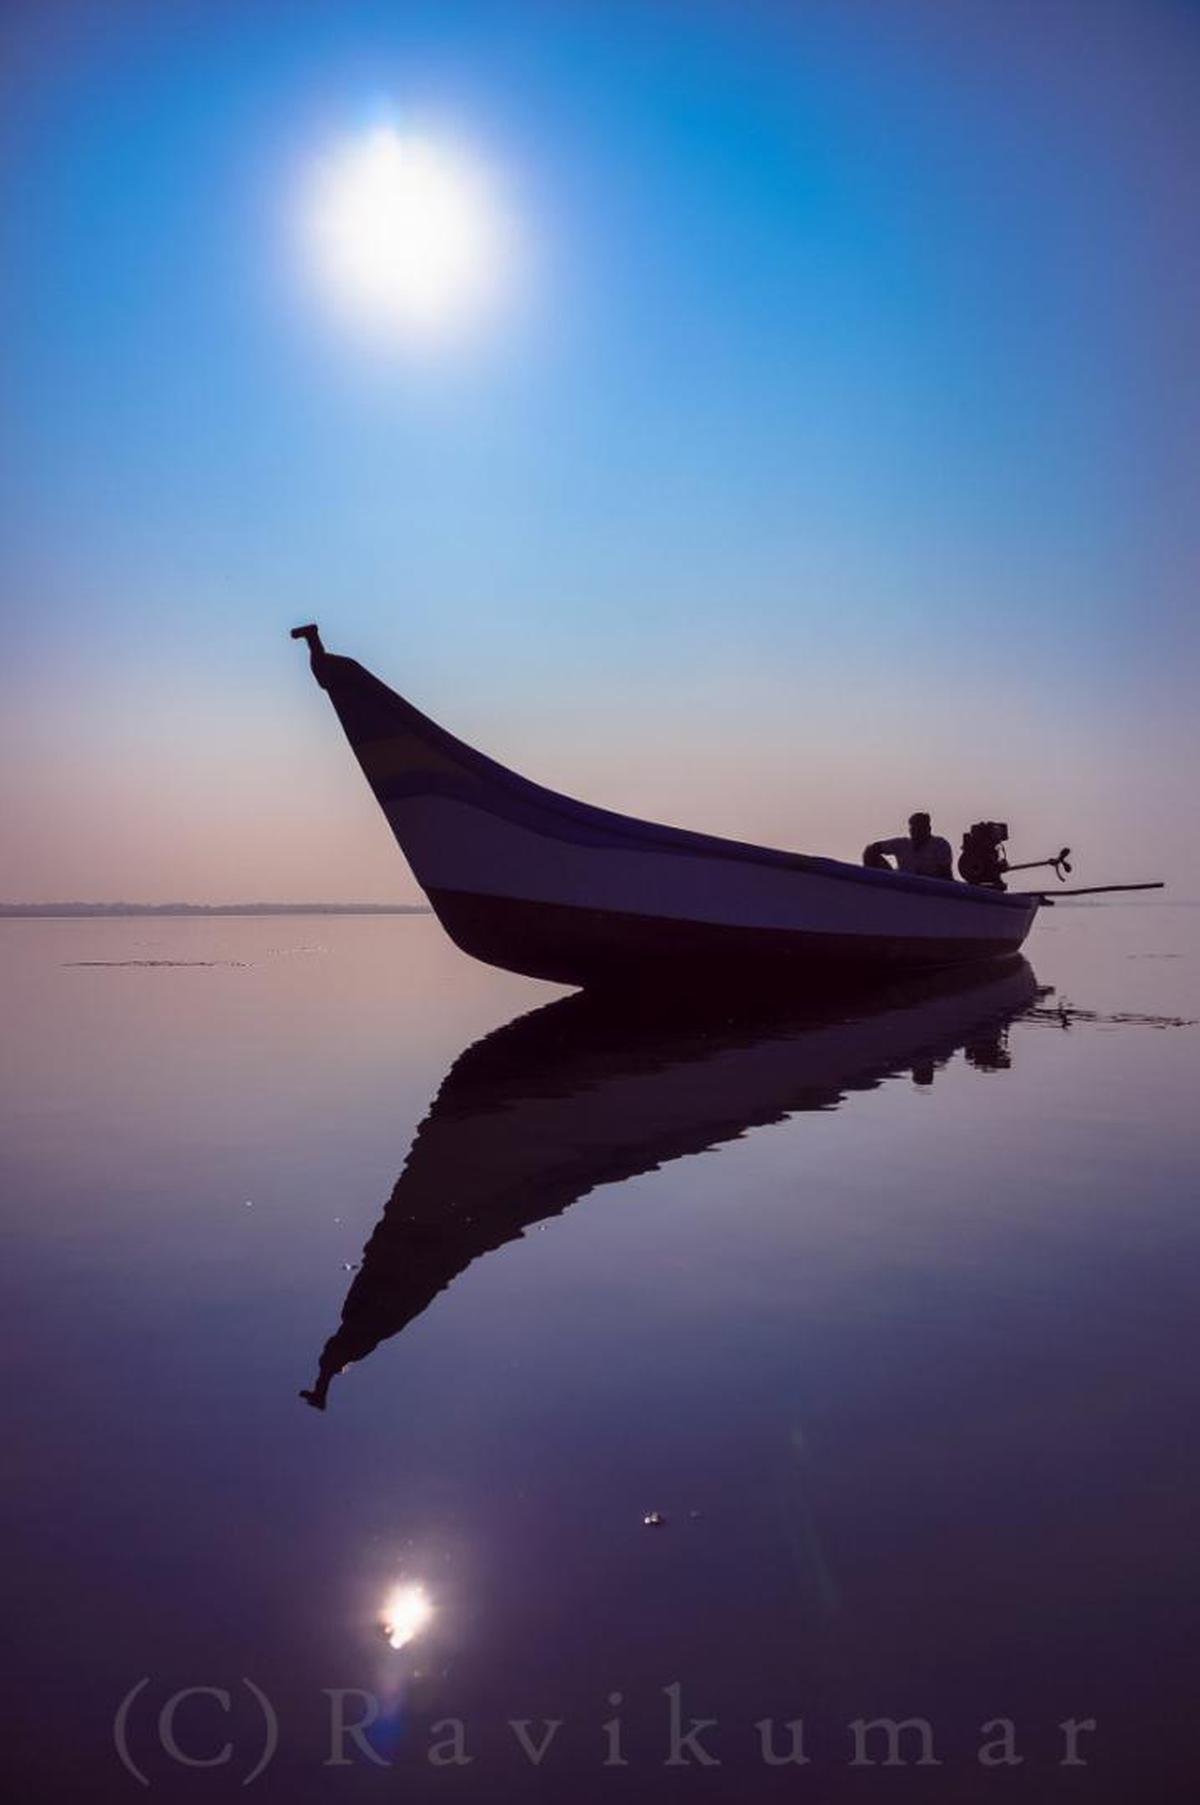 Image of Sky, Water, Reflection, Calm, Sea, Horizon etc.